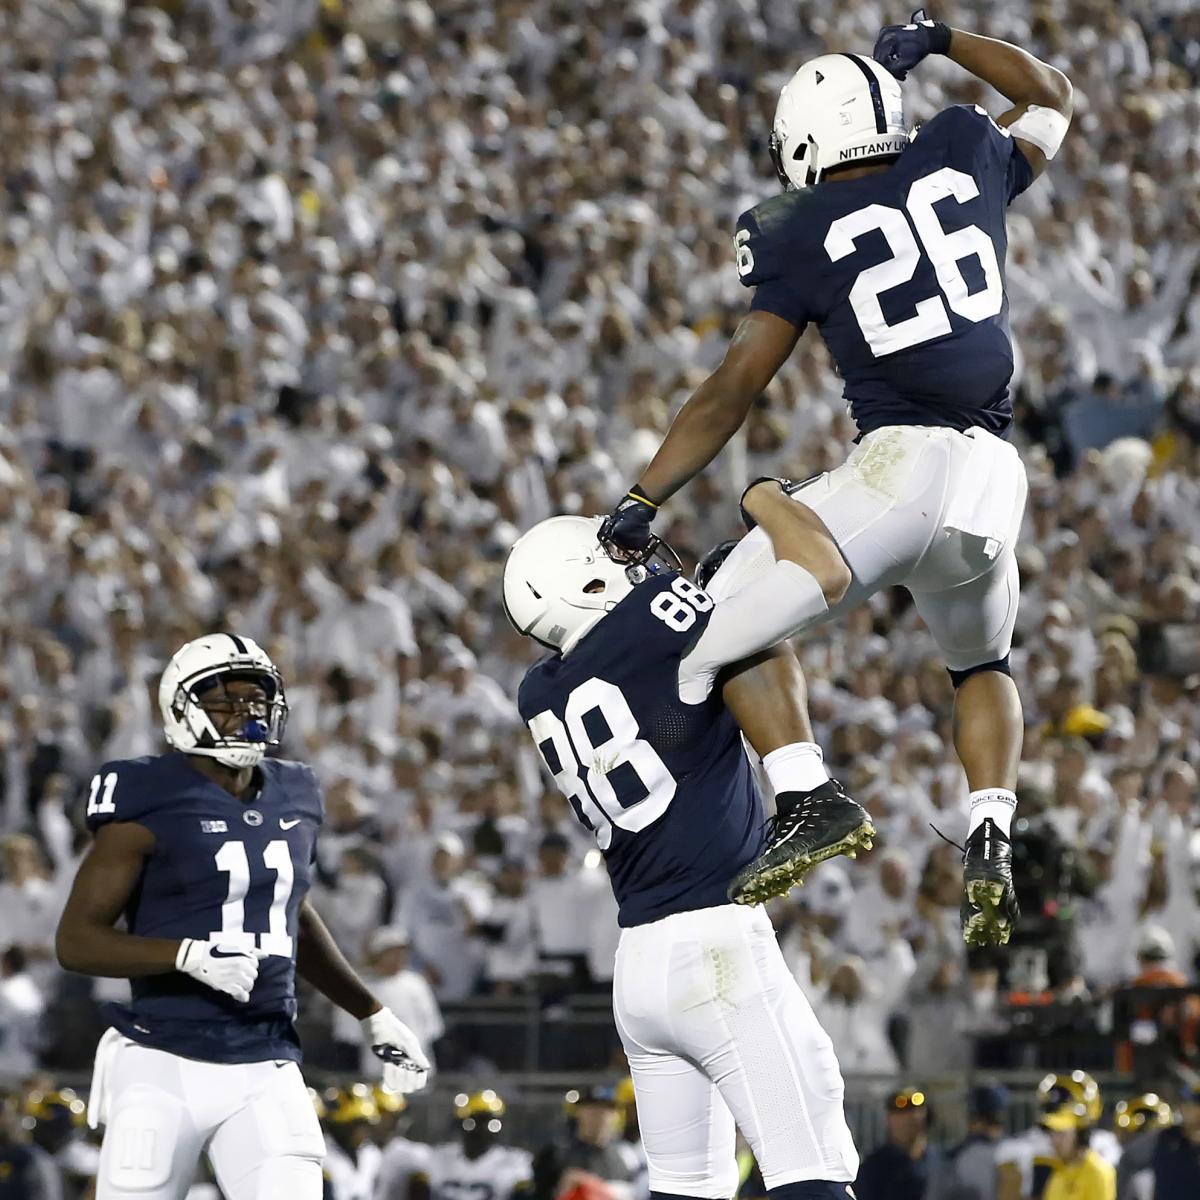 AP College Football Poll 2017: Week 9 Top 25 Rankings Announced